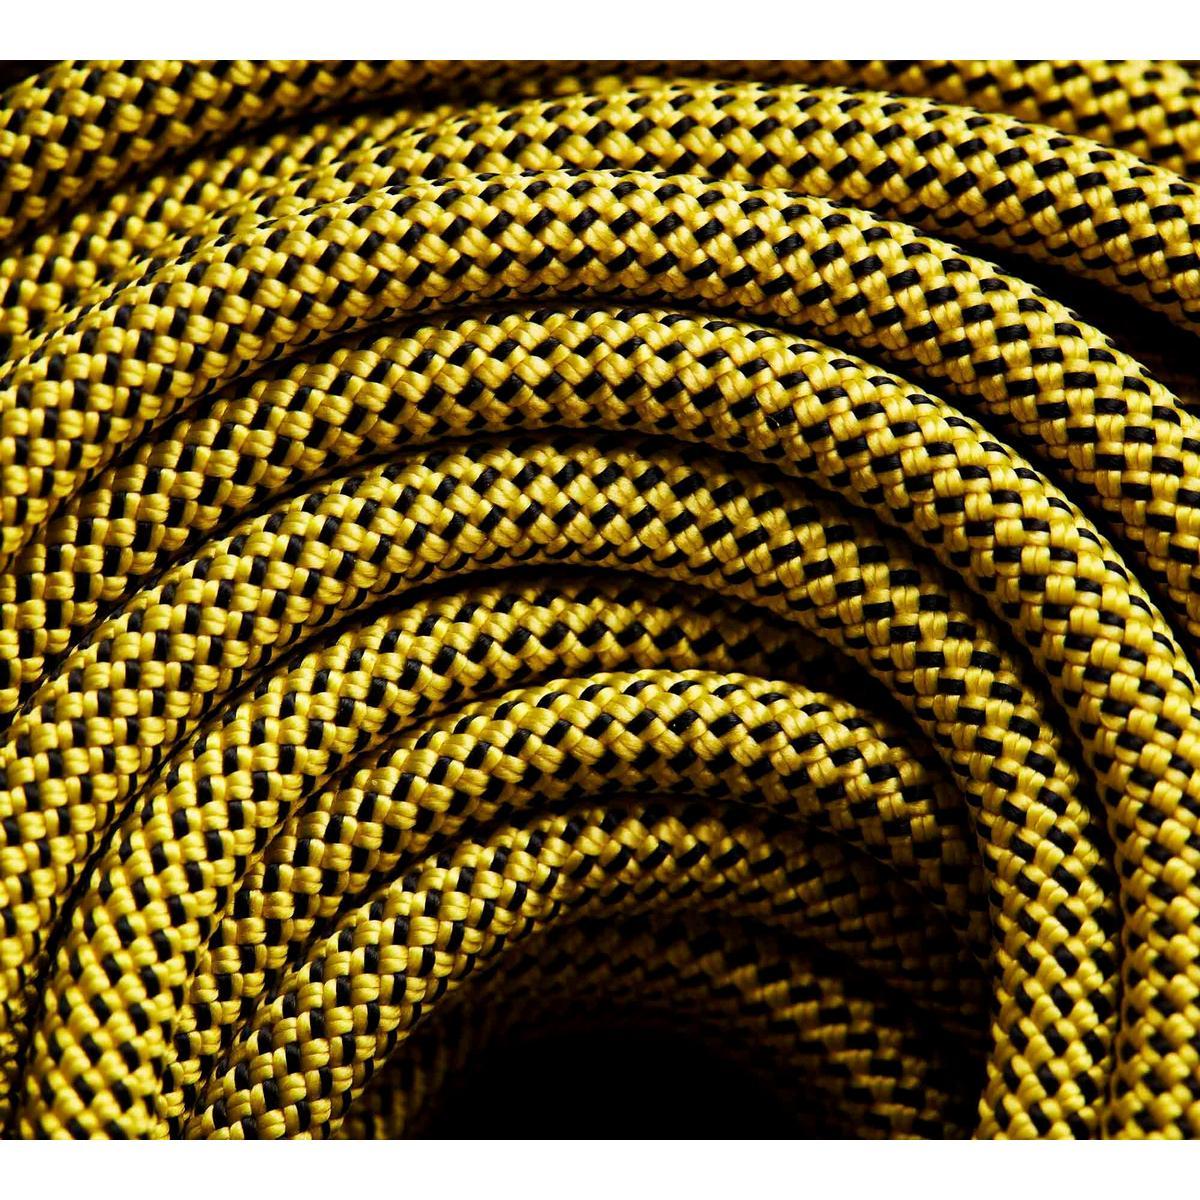 Black Diamond Equipment Black Diamond Climbing Rope 9.4 mm x 60 m Gold